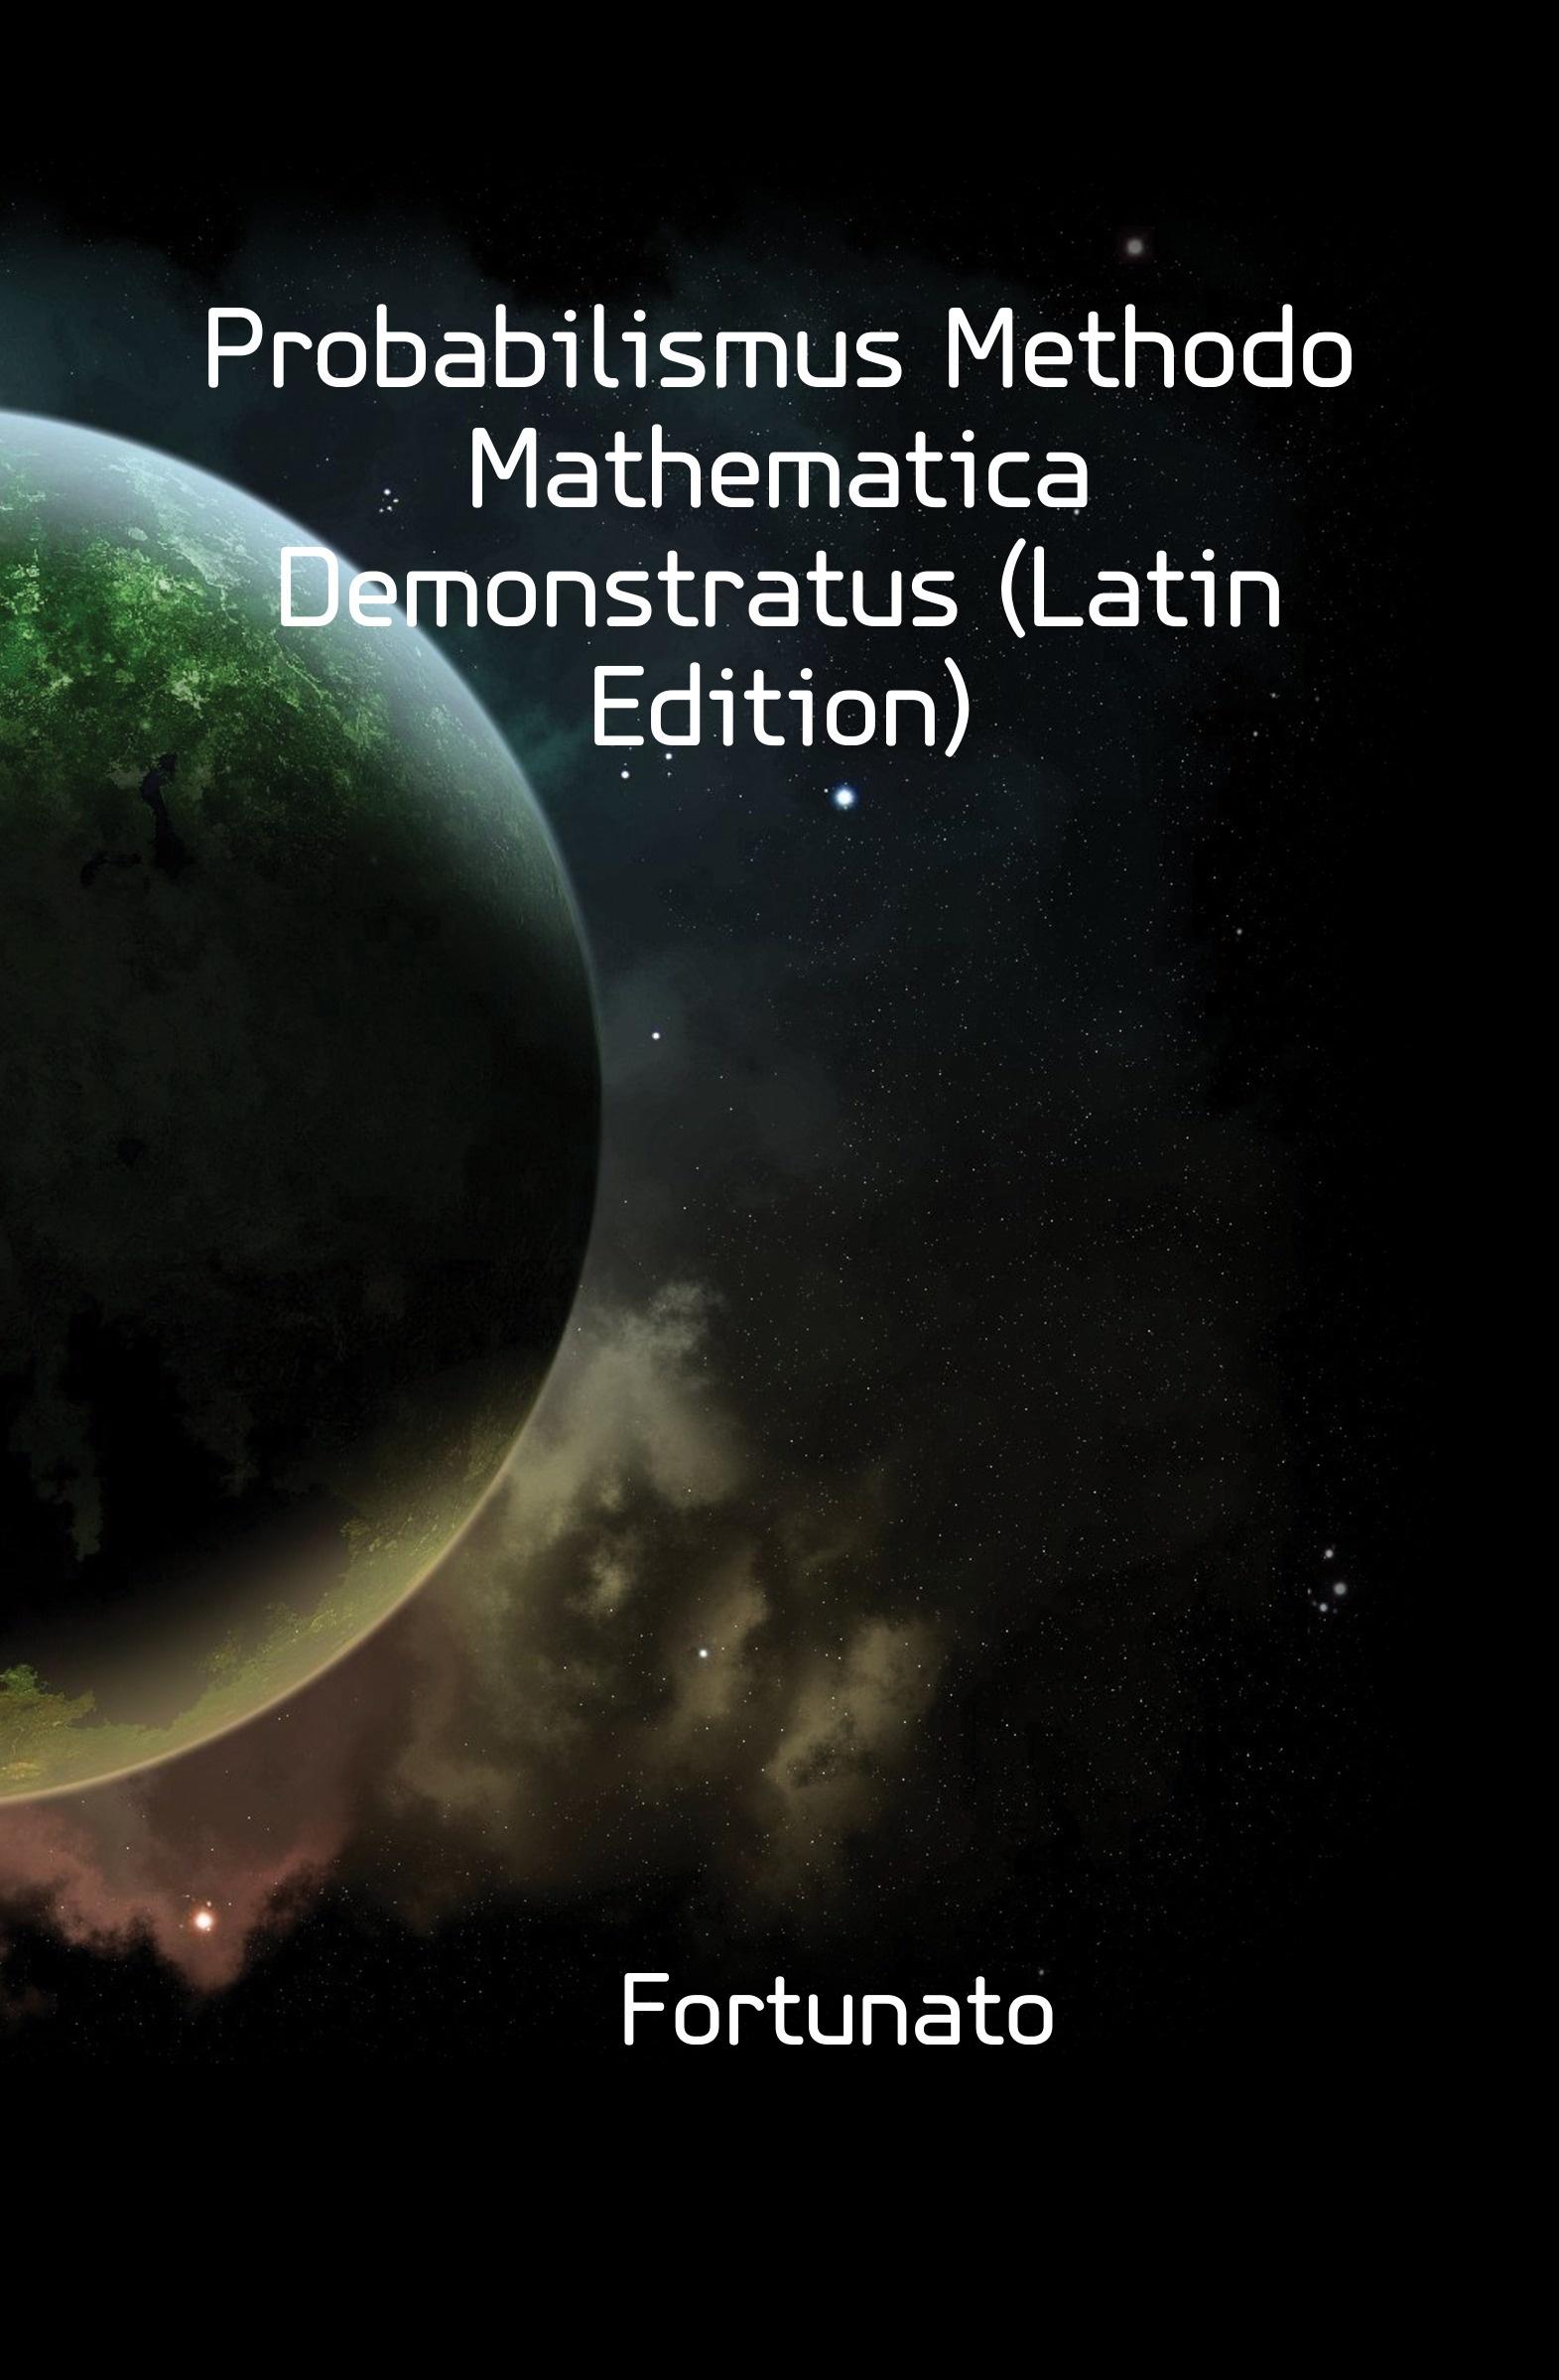 Fortunato Da Brescia Probabilismus Methodo Mathematica Demonstratus (Latin Edition) bang herman min gamle kammerat